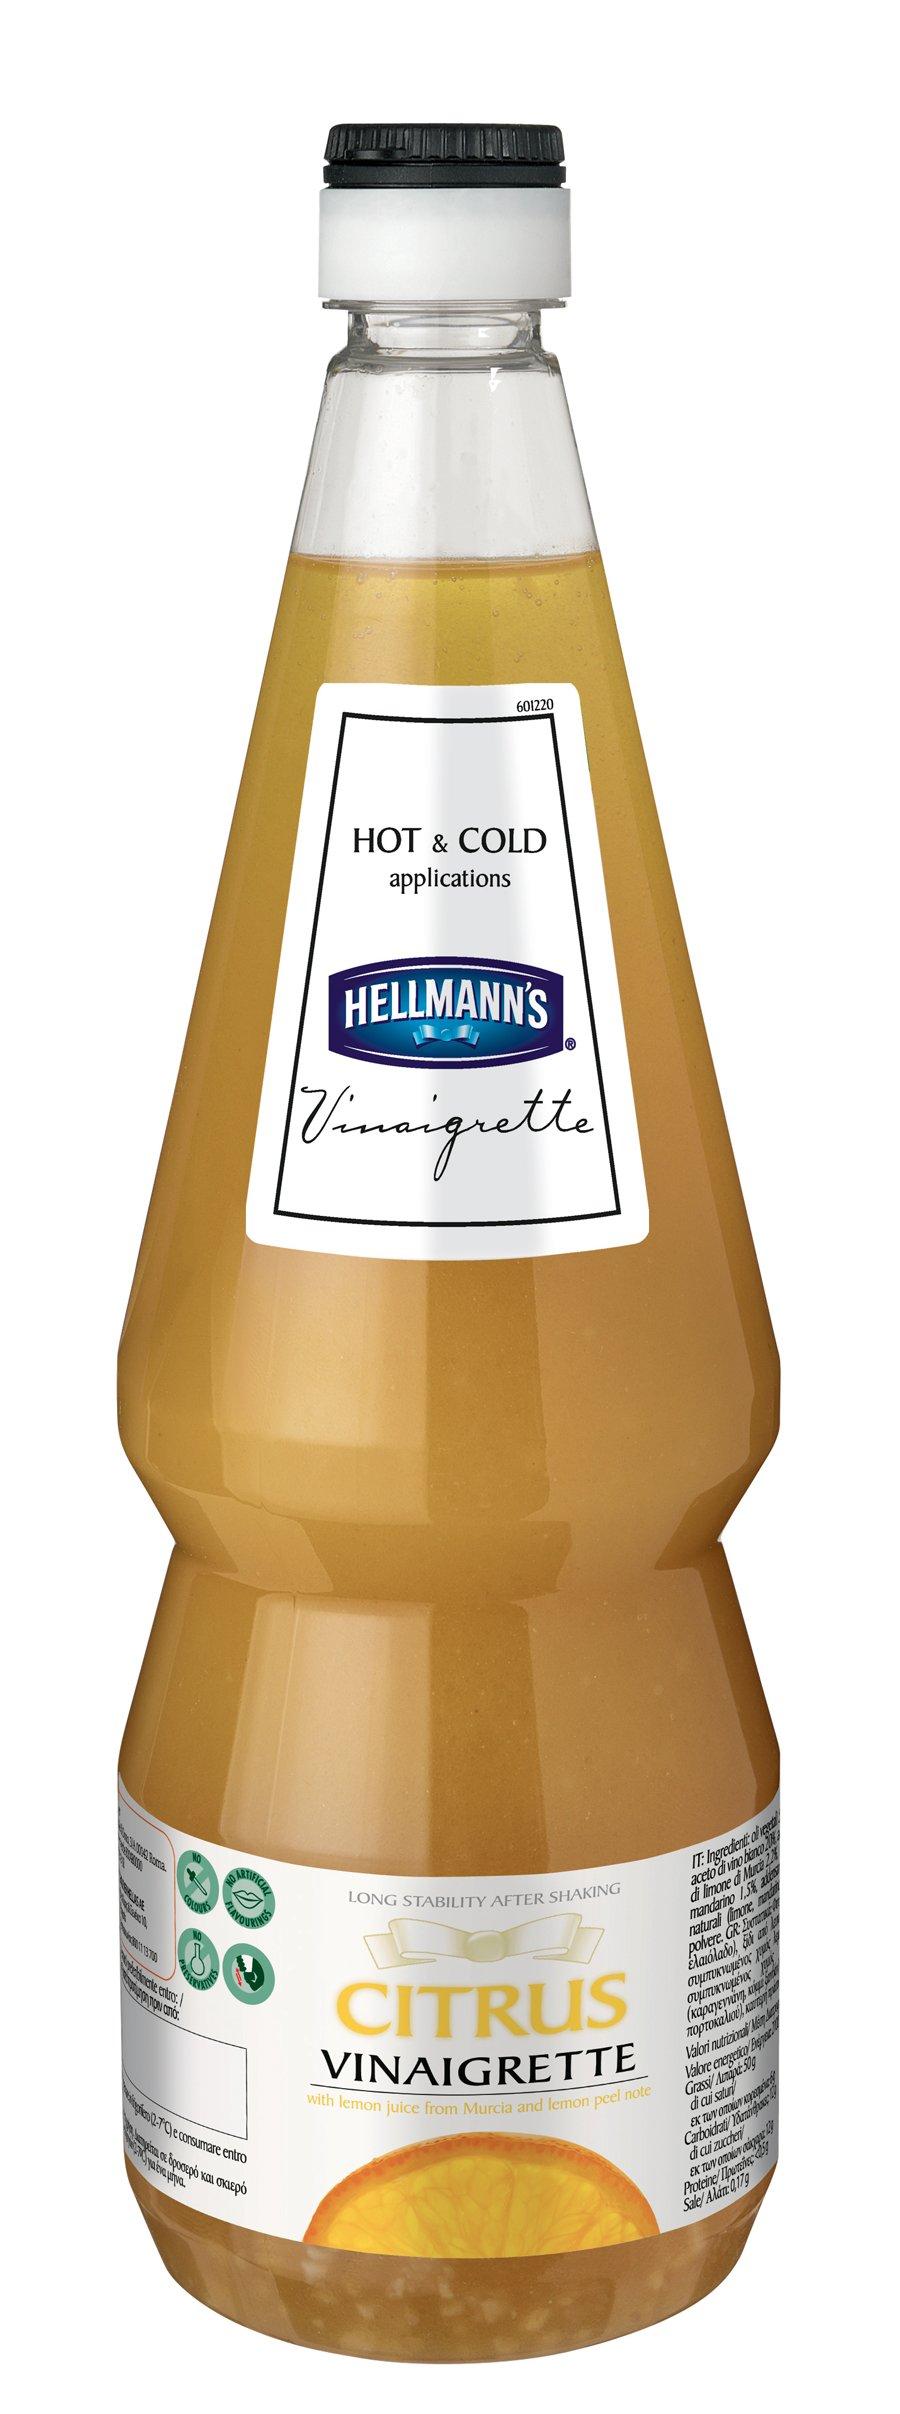 Hellmann's Citrus Vinaigrette 1 Lt